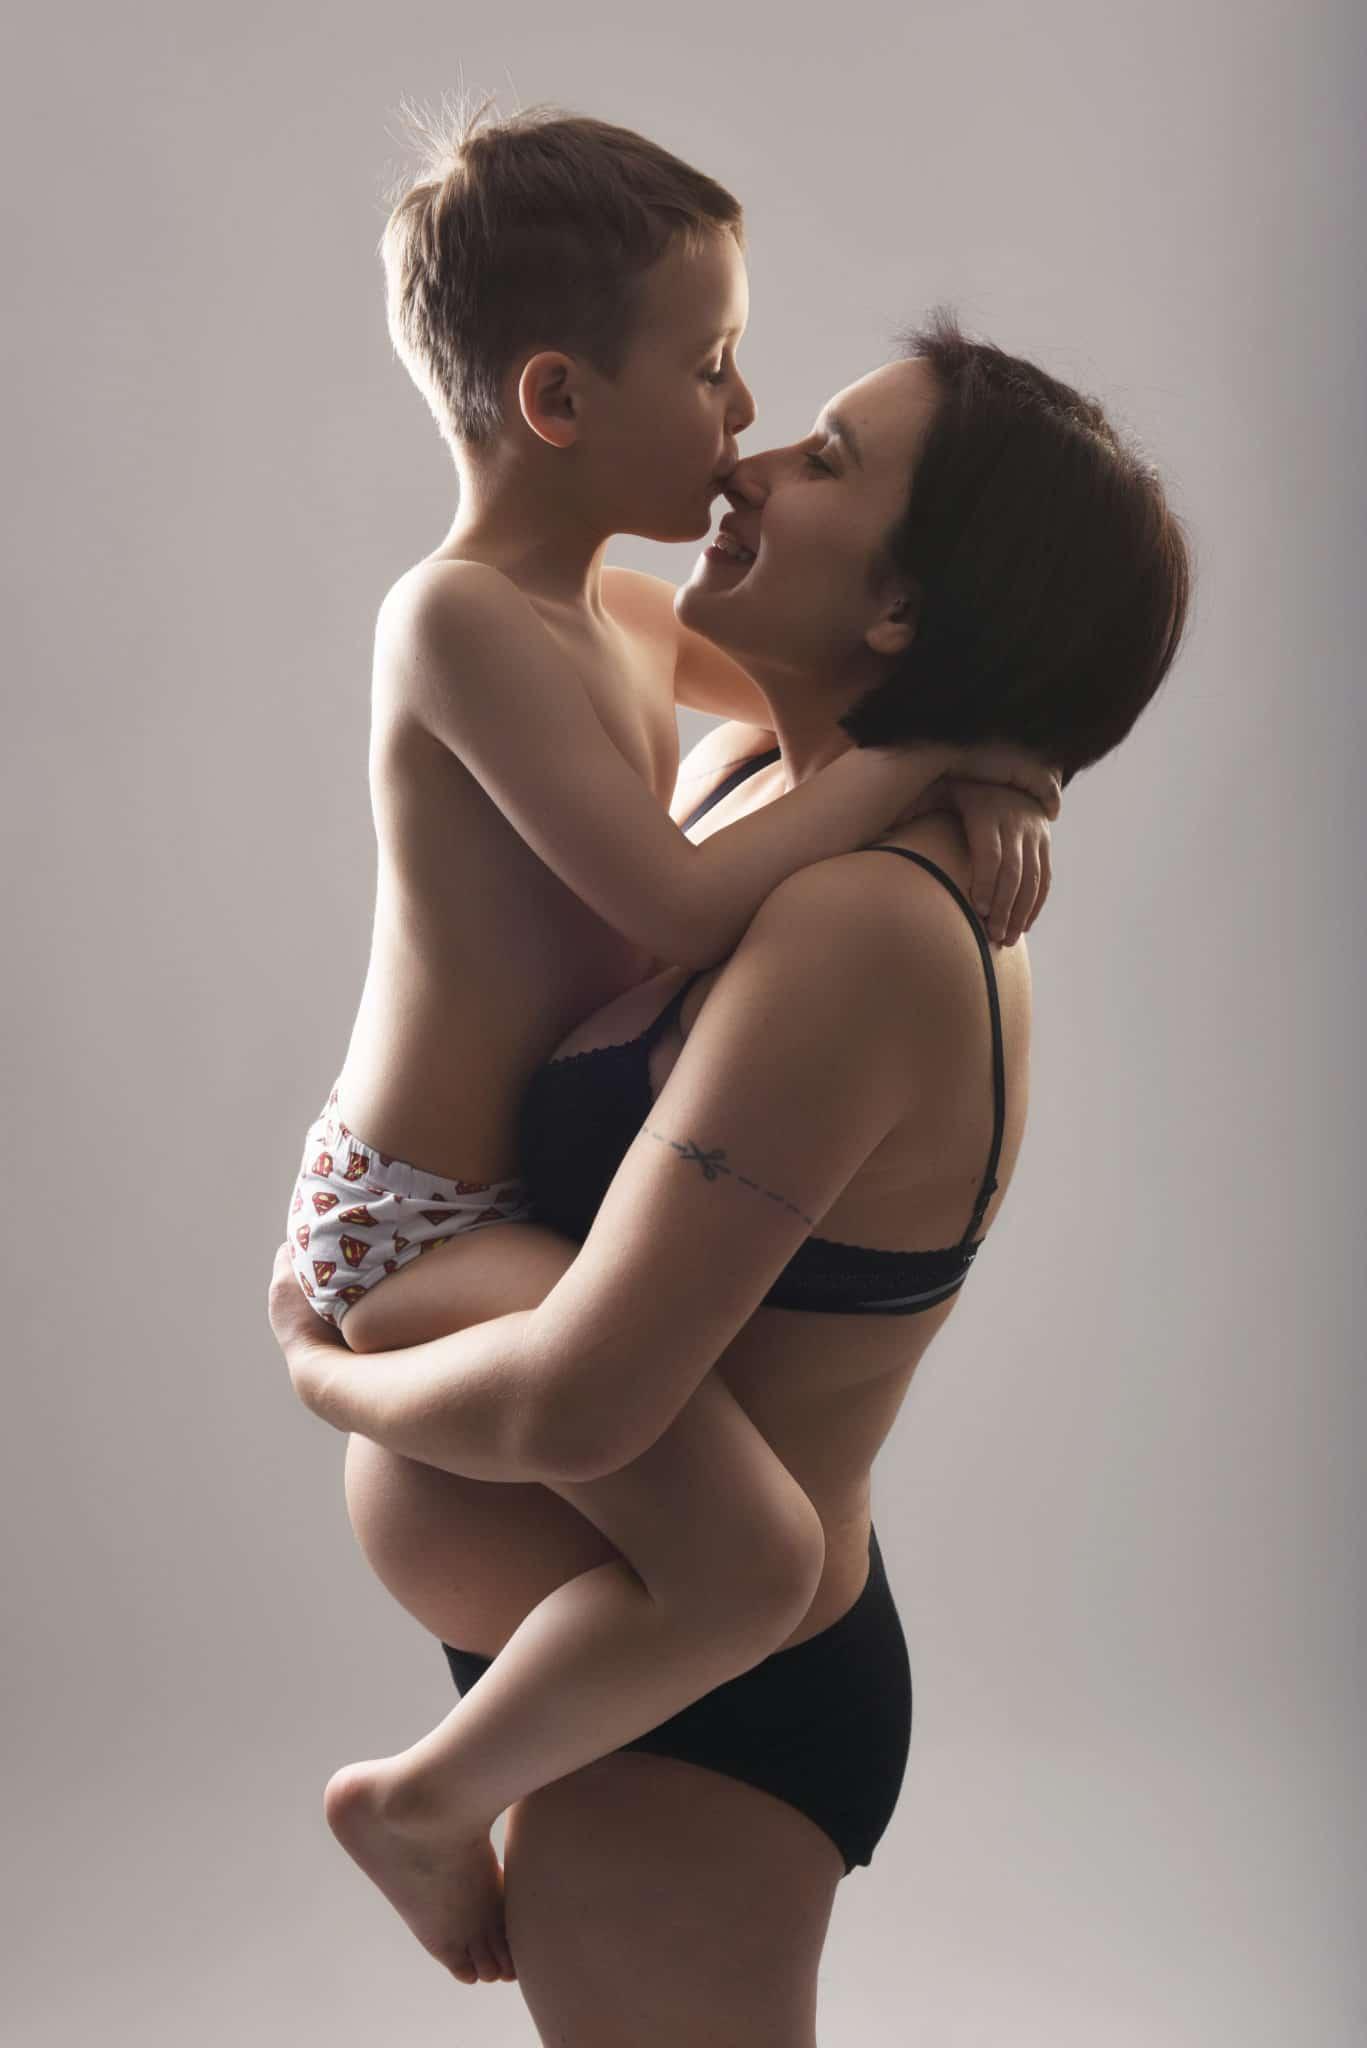 photo-shooting-grossesse-maternite-lausanne-studio-artistique-femme-enceinte-photographe